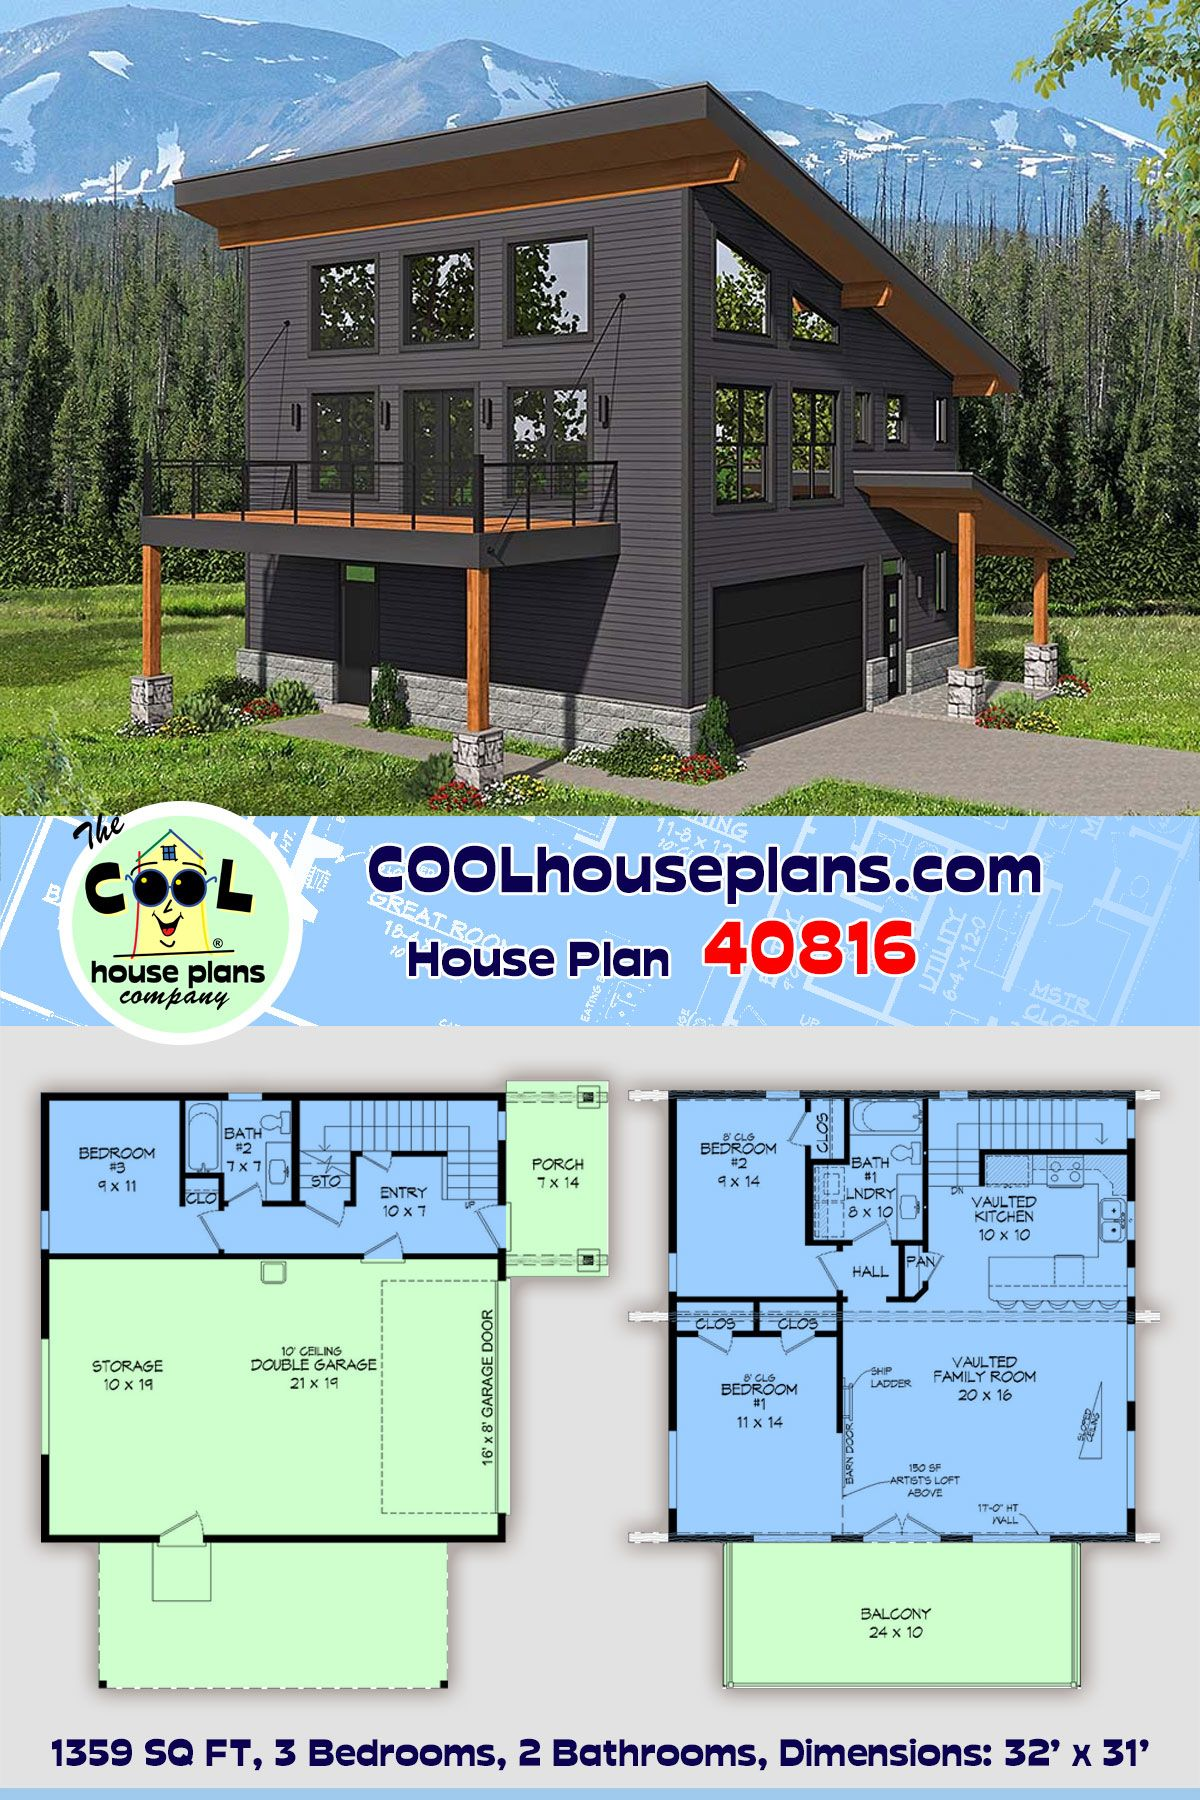 Modern Style Garage Living Plan 40816 With 3 Bed 2 Bath 2 Car Garage House Plans Garage House Plans Garage Apartment Plan